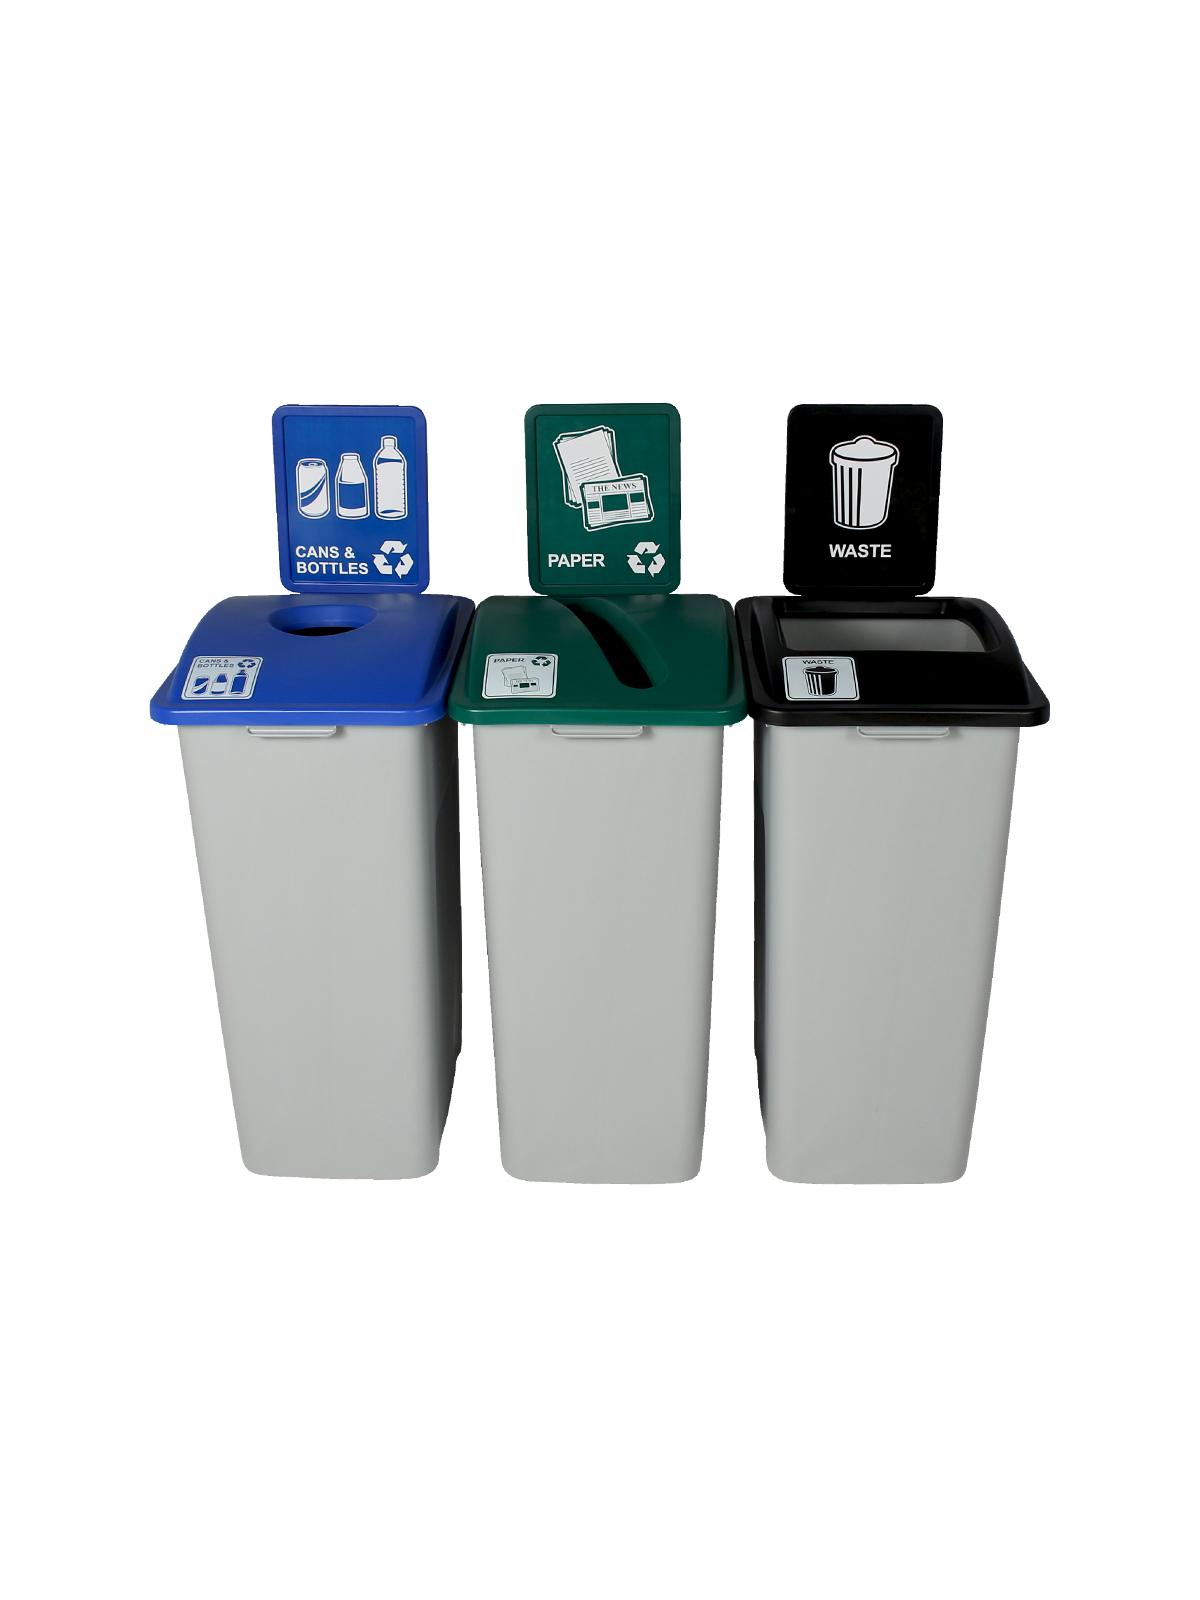 WASTE WATCHER XL - Triple - Cans & Bottles-Paper-Waste - Circle-Slot-Full - Grey-Blue-Green-Black